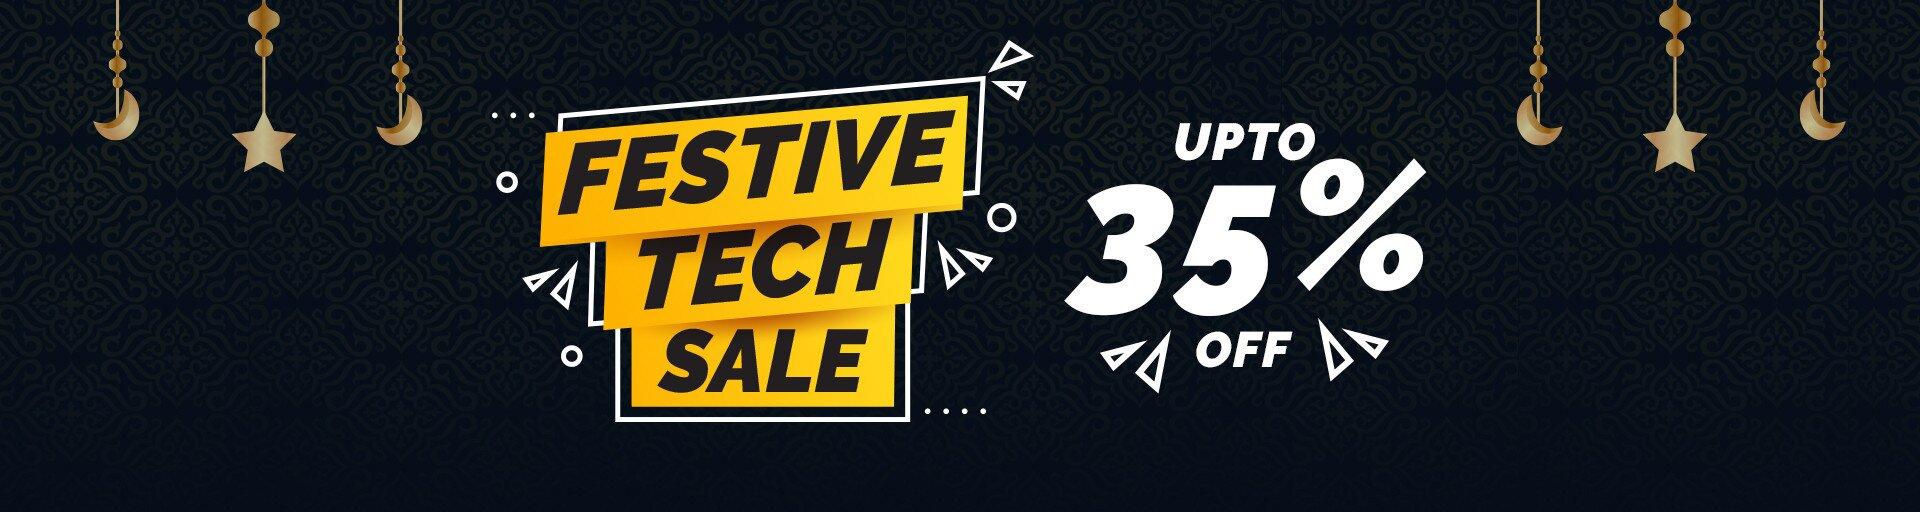 Festive tech sale